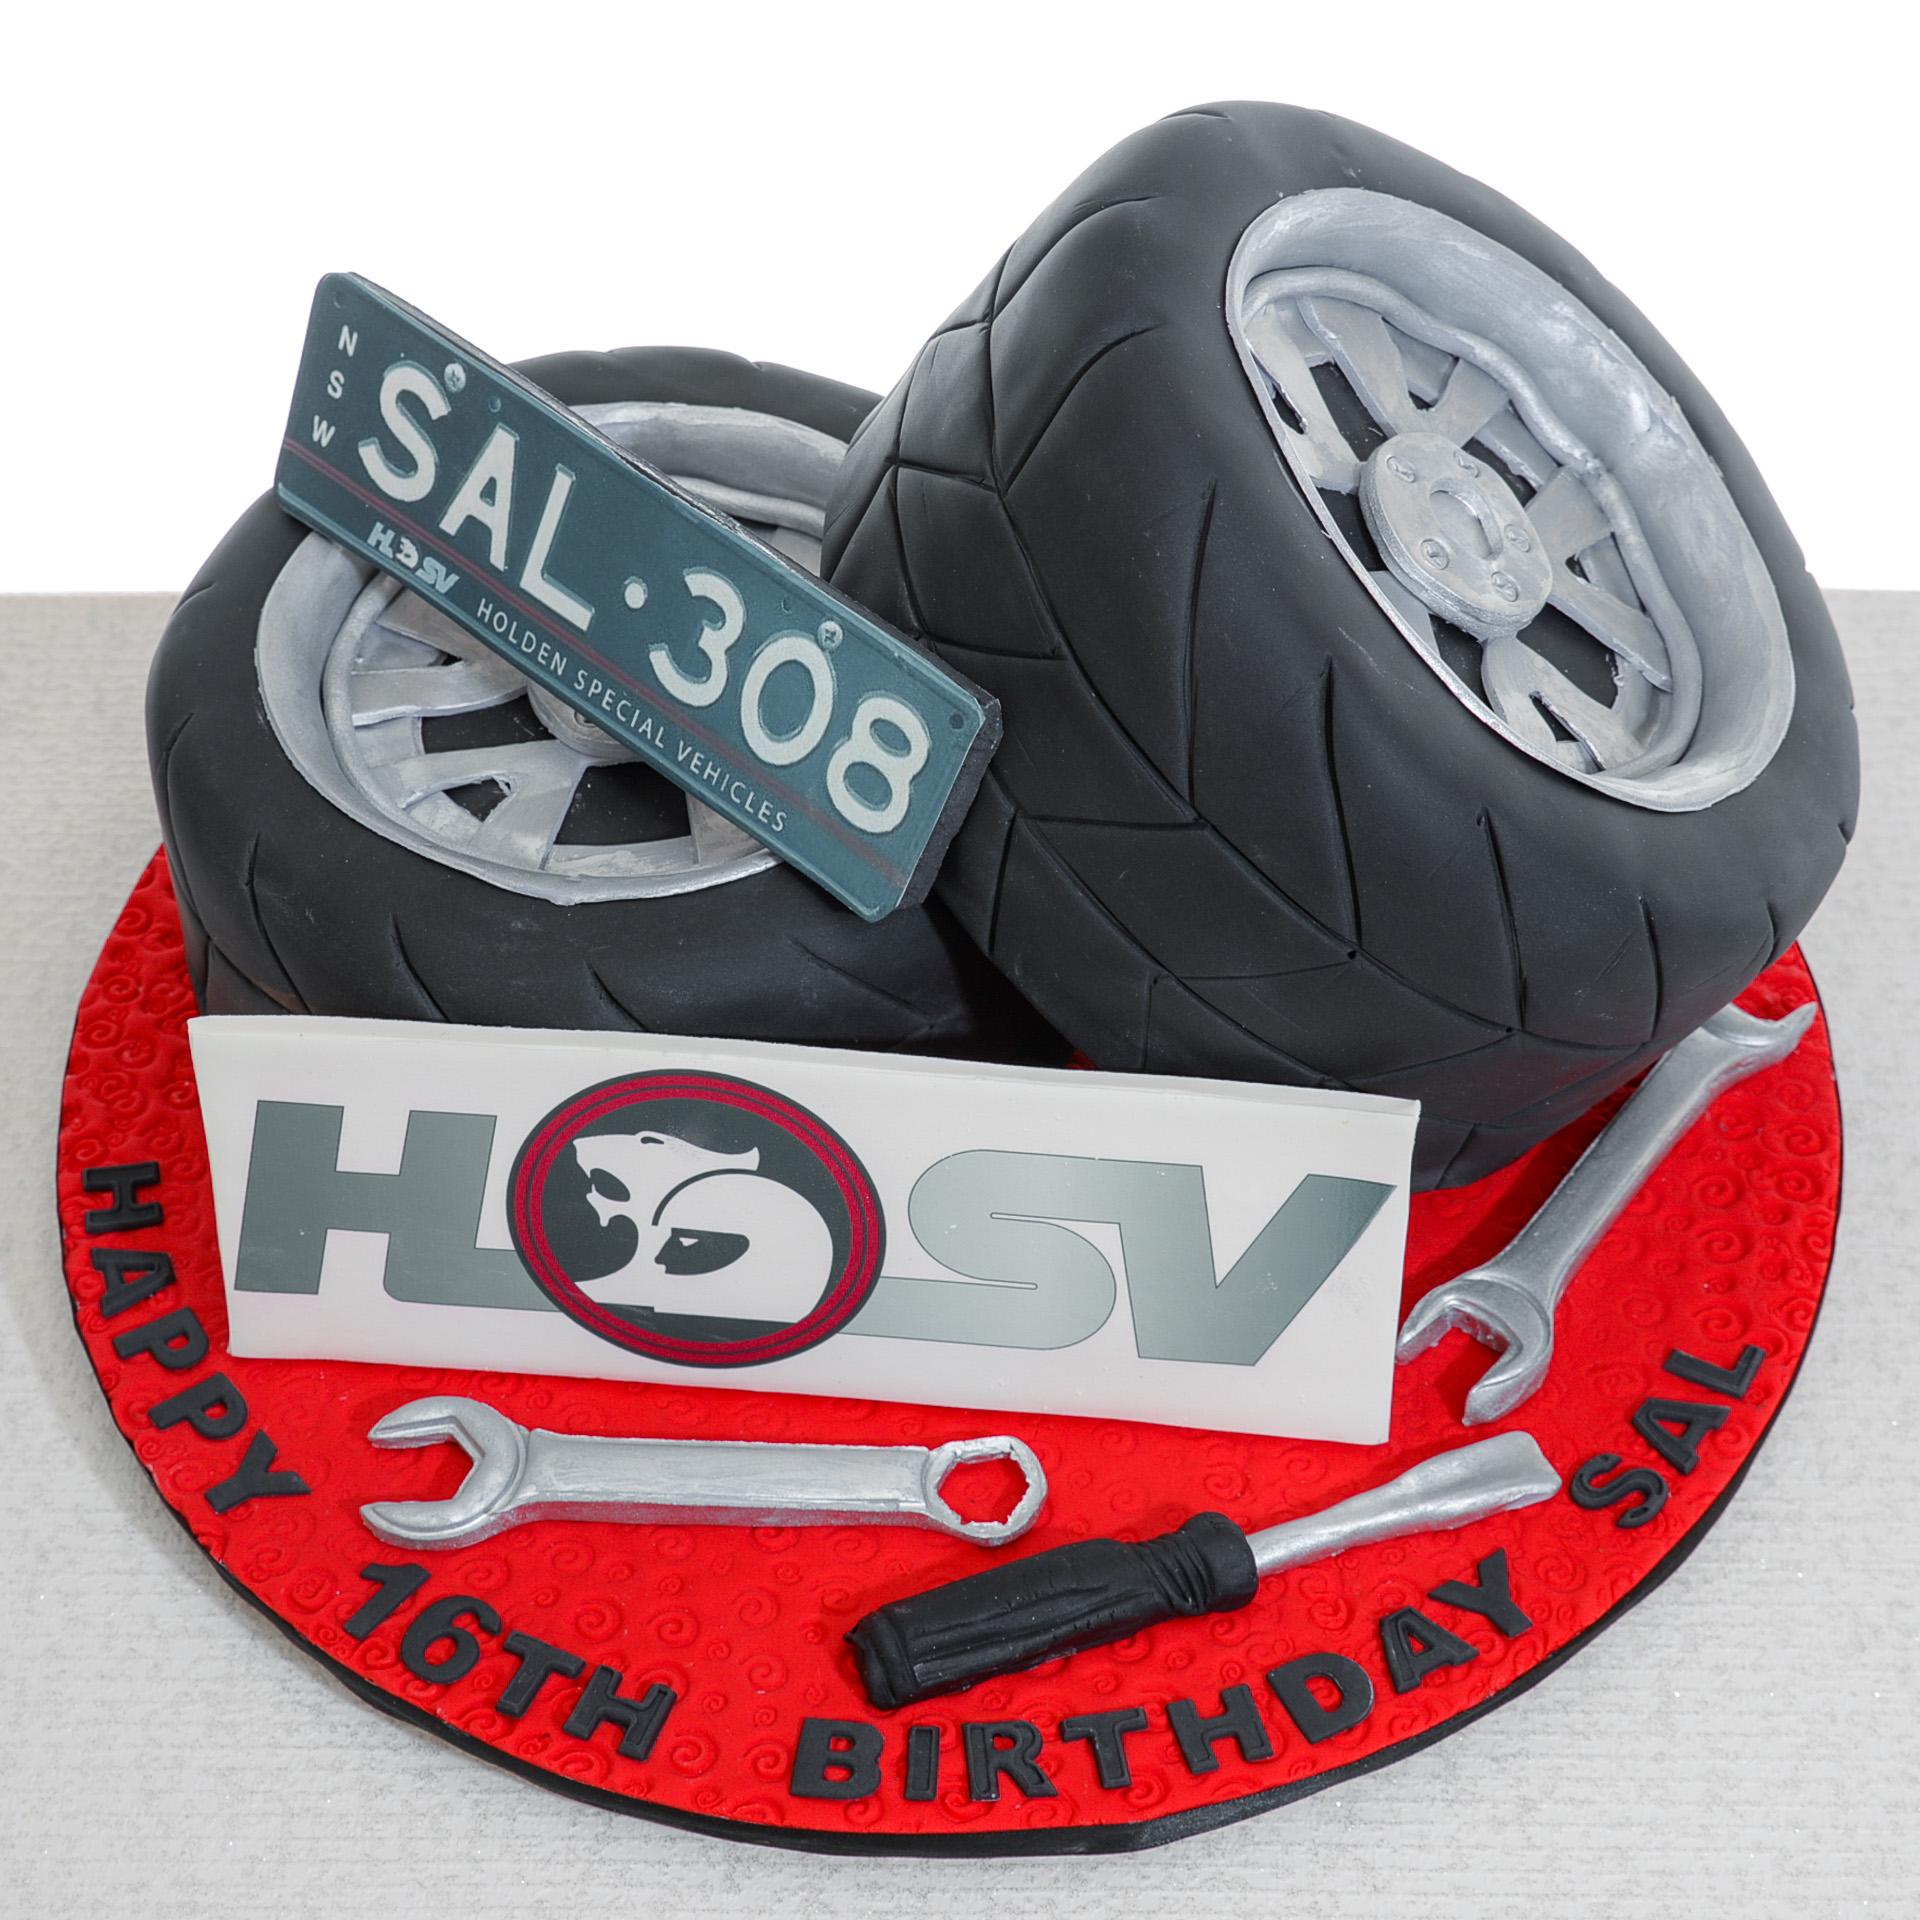 HSV-Holden-Birthday-Cake.jpg